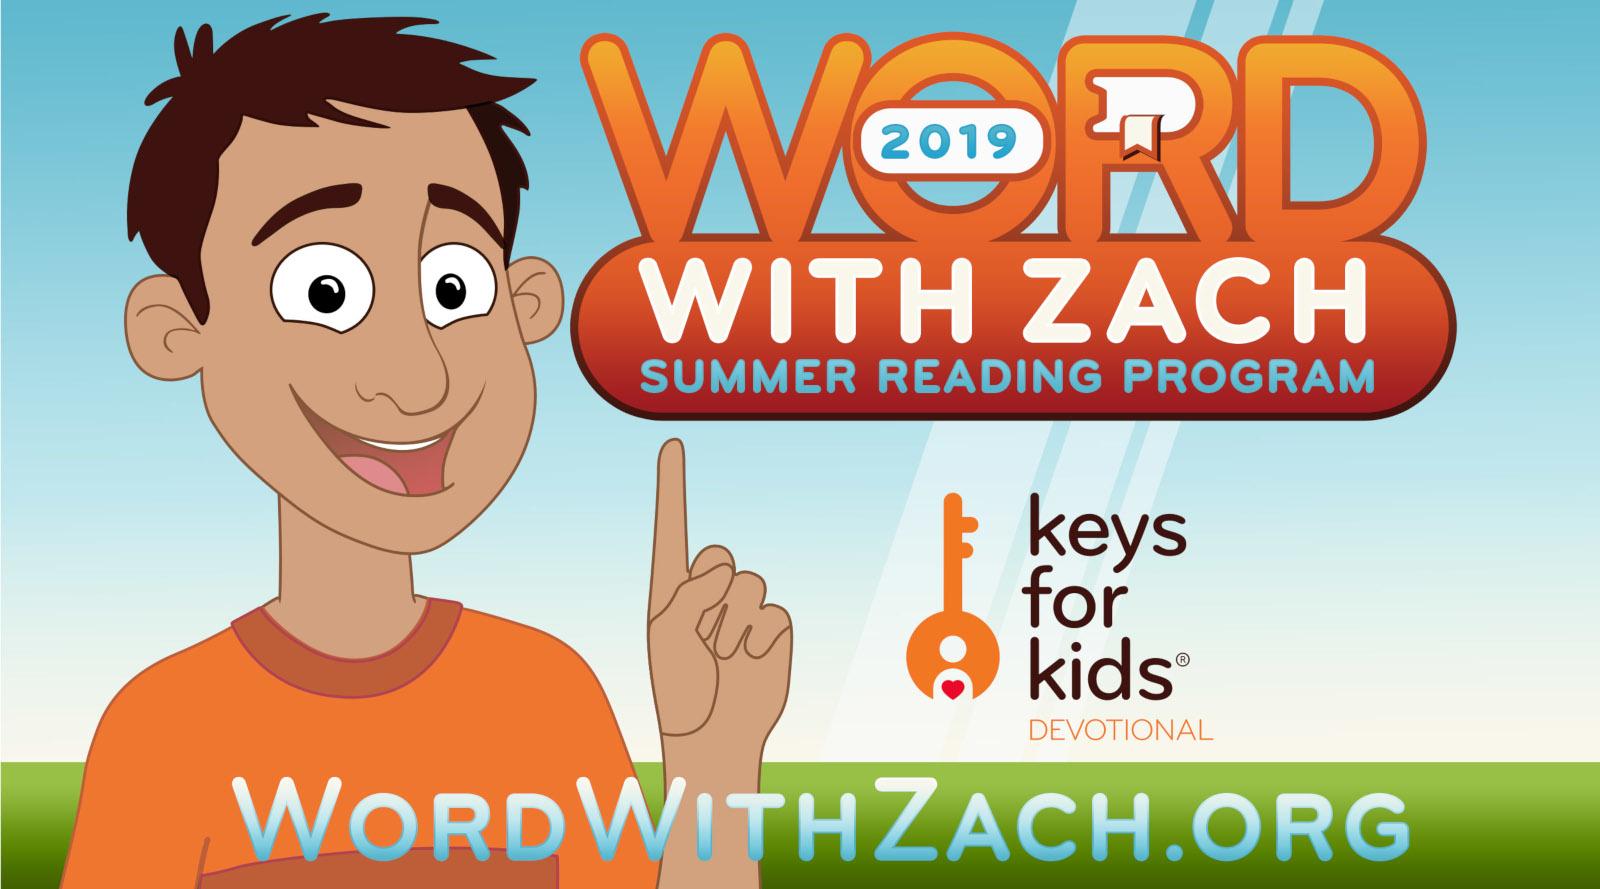 Kids can grow spiritually through reading this summer!